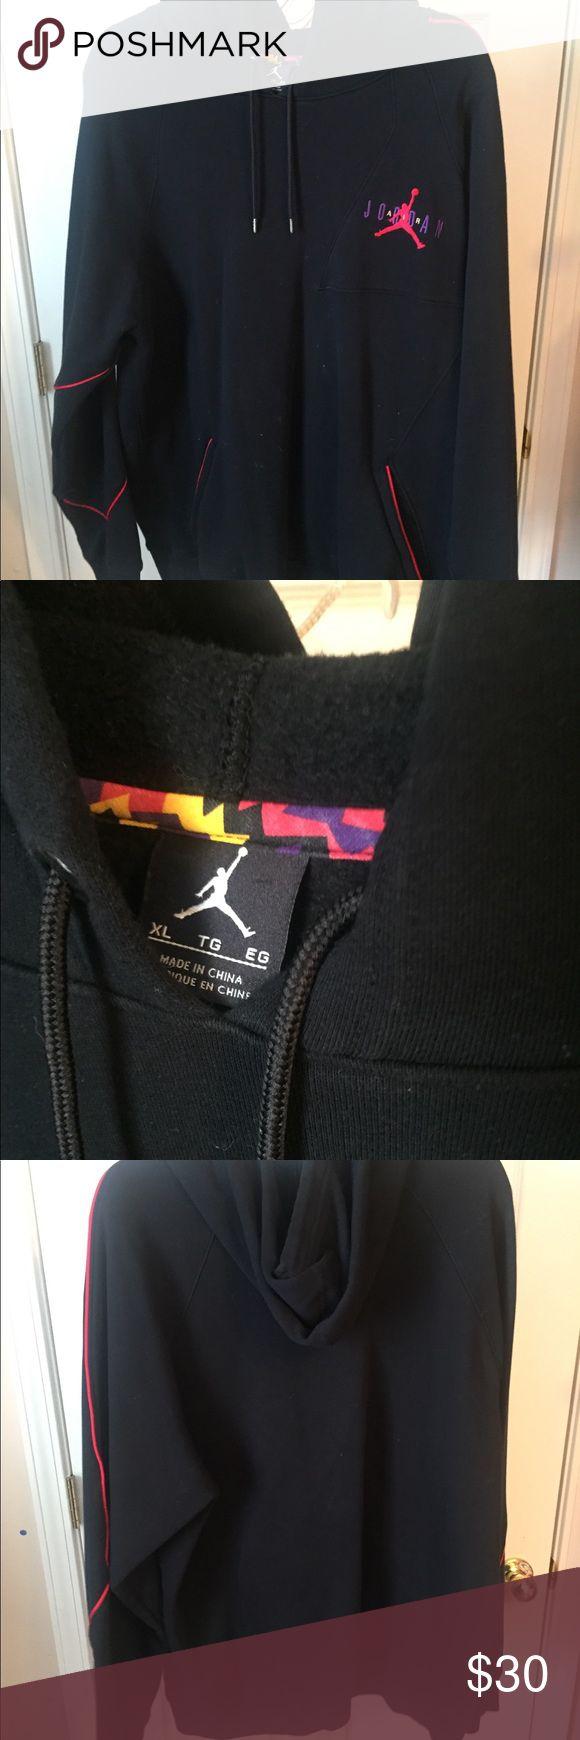 Mens Nike air Jordan hoodie rare Jordan 7 sweater This is a men's Nike air Jordan hoodie based of the design of the Jordan 7 sweater shoes. Size xl. Offer me a price. Jordan Jackets & Coats Performance Jackets